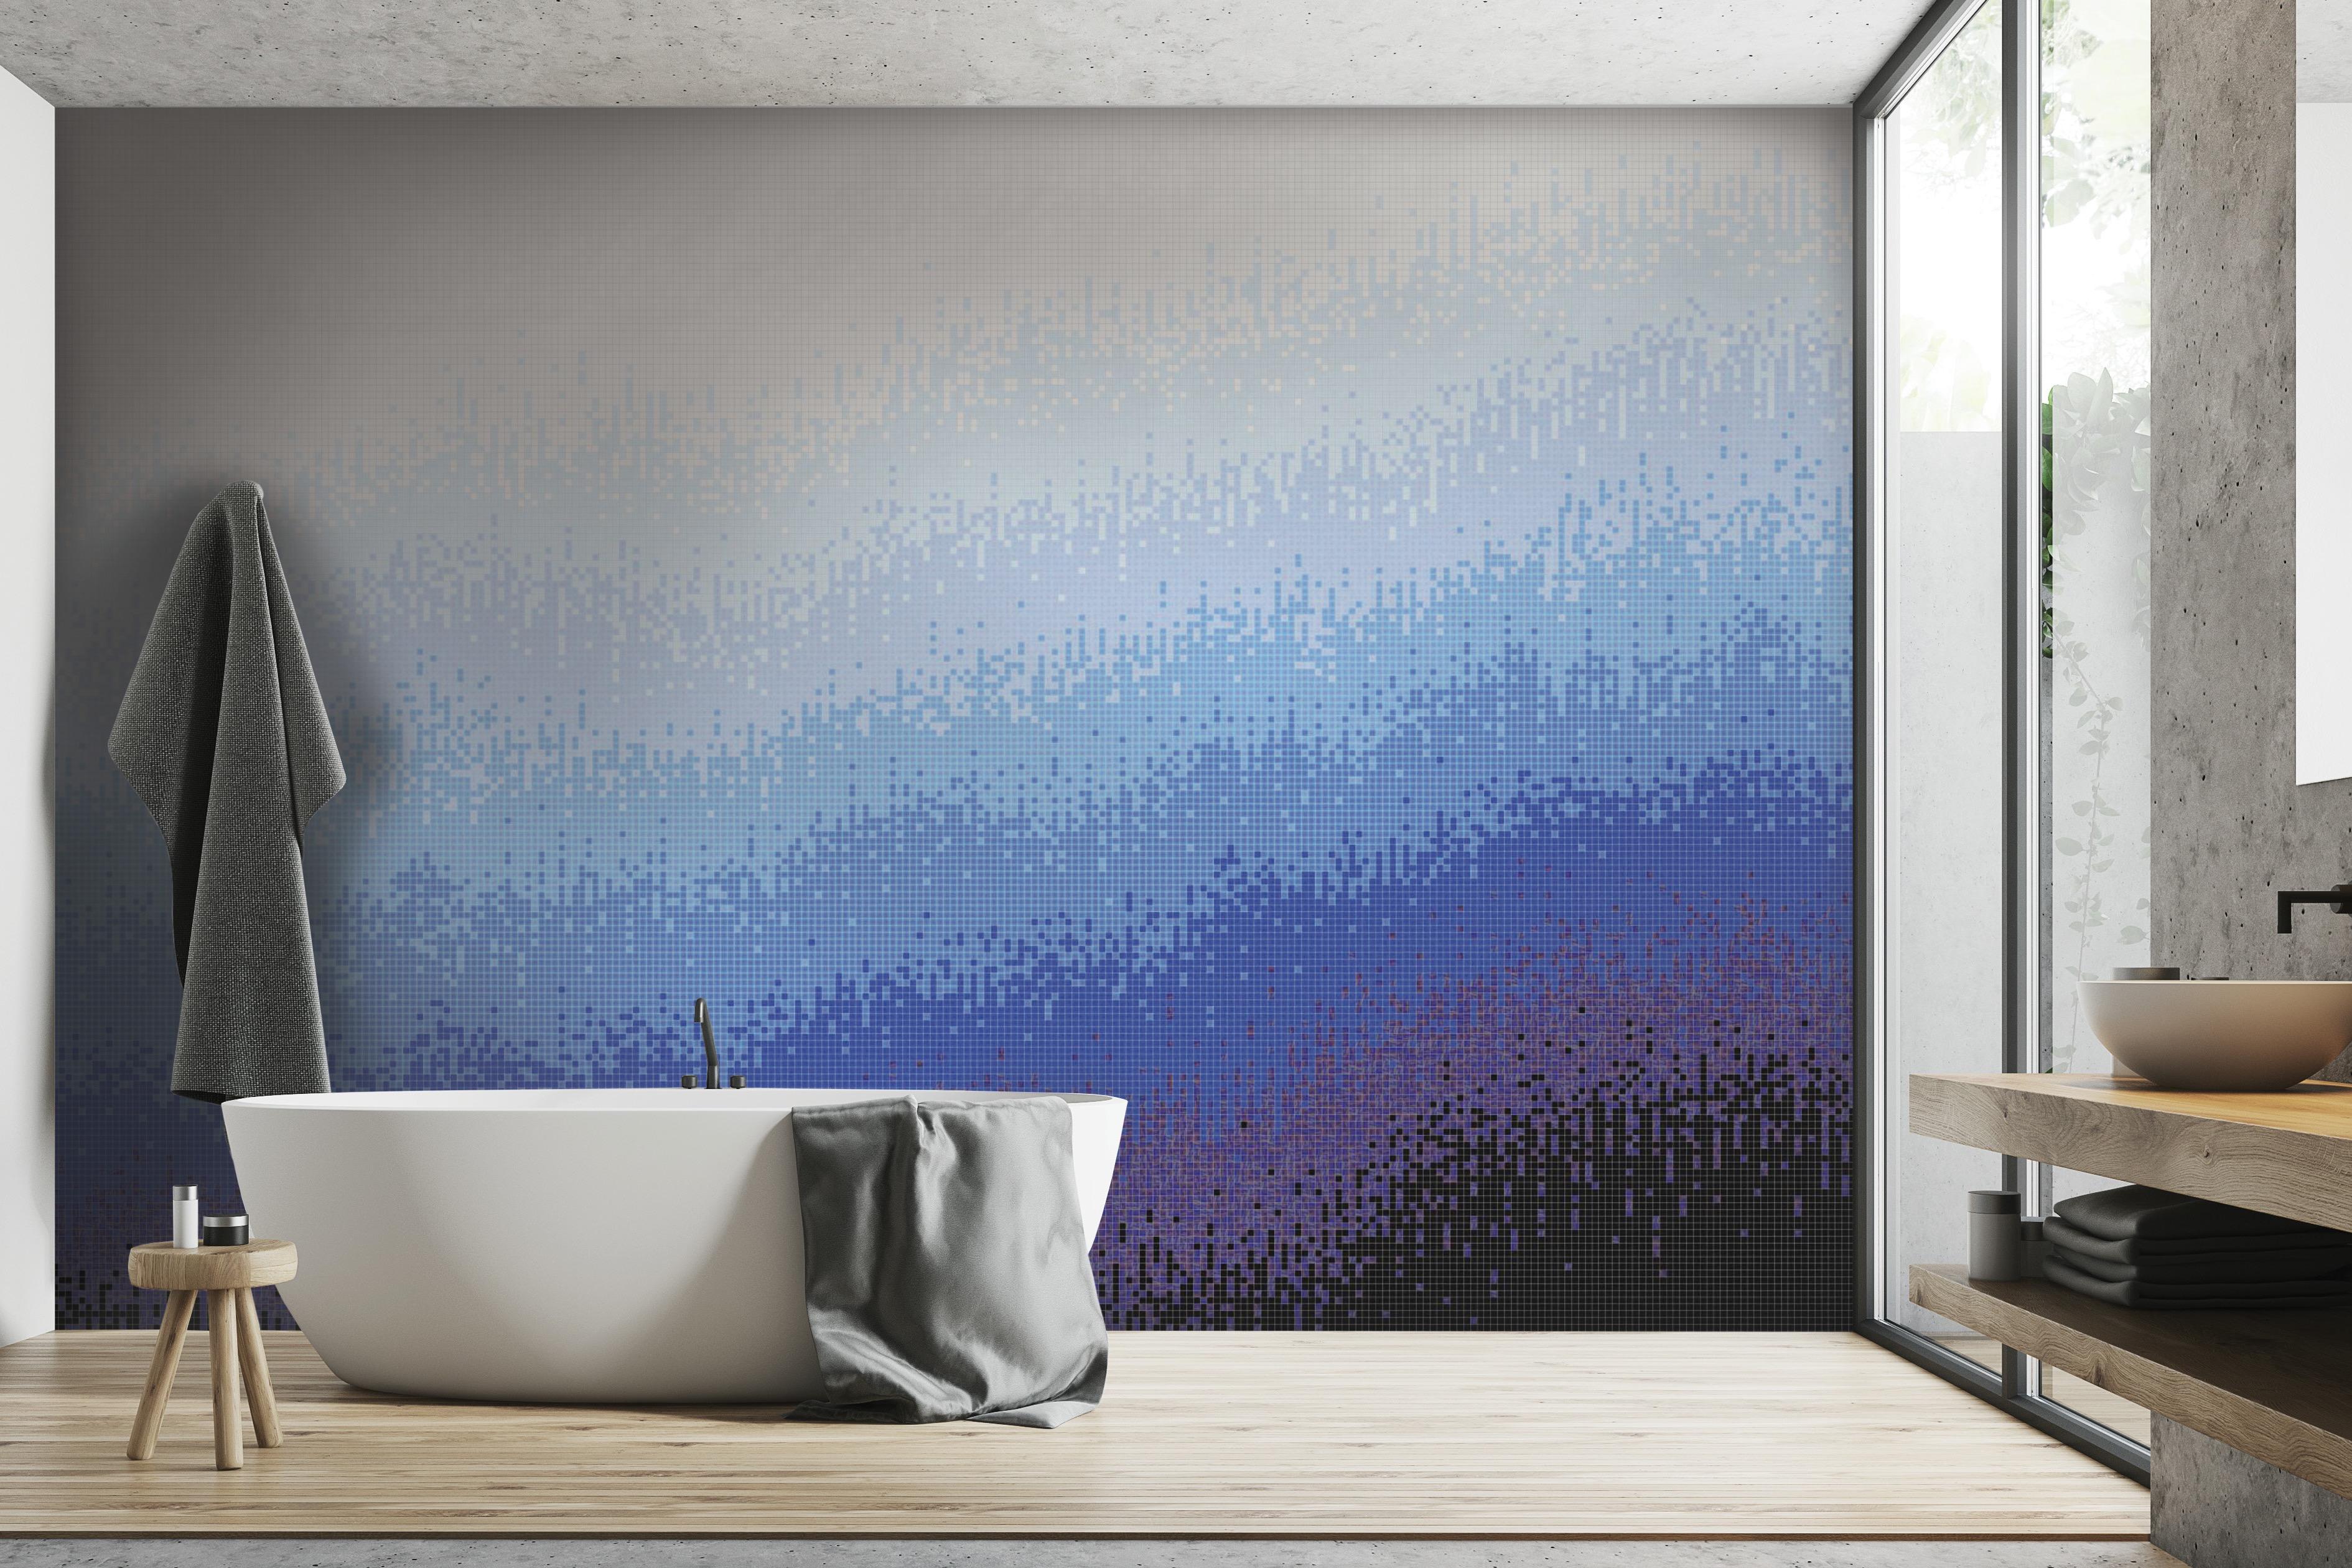 sediment-glacier-modern-bathroom-bathroom-wall-blue-tile-mosaic-mural-by-artaic-0121703